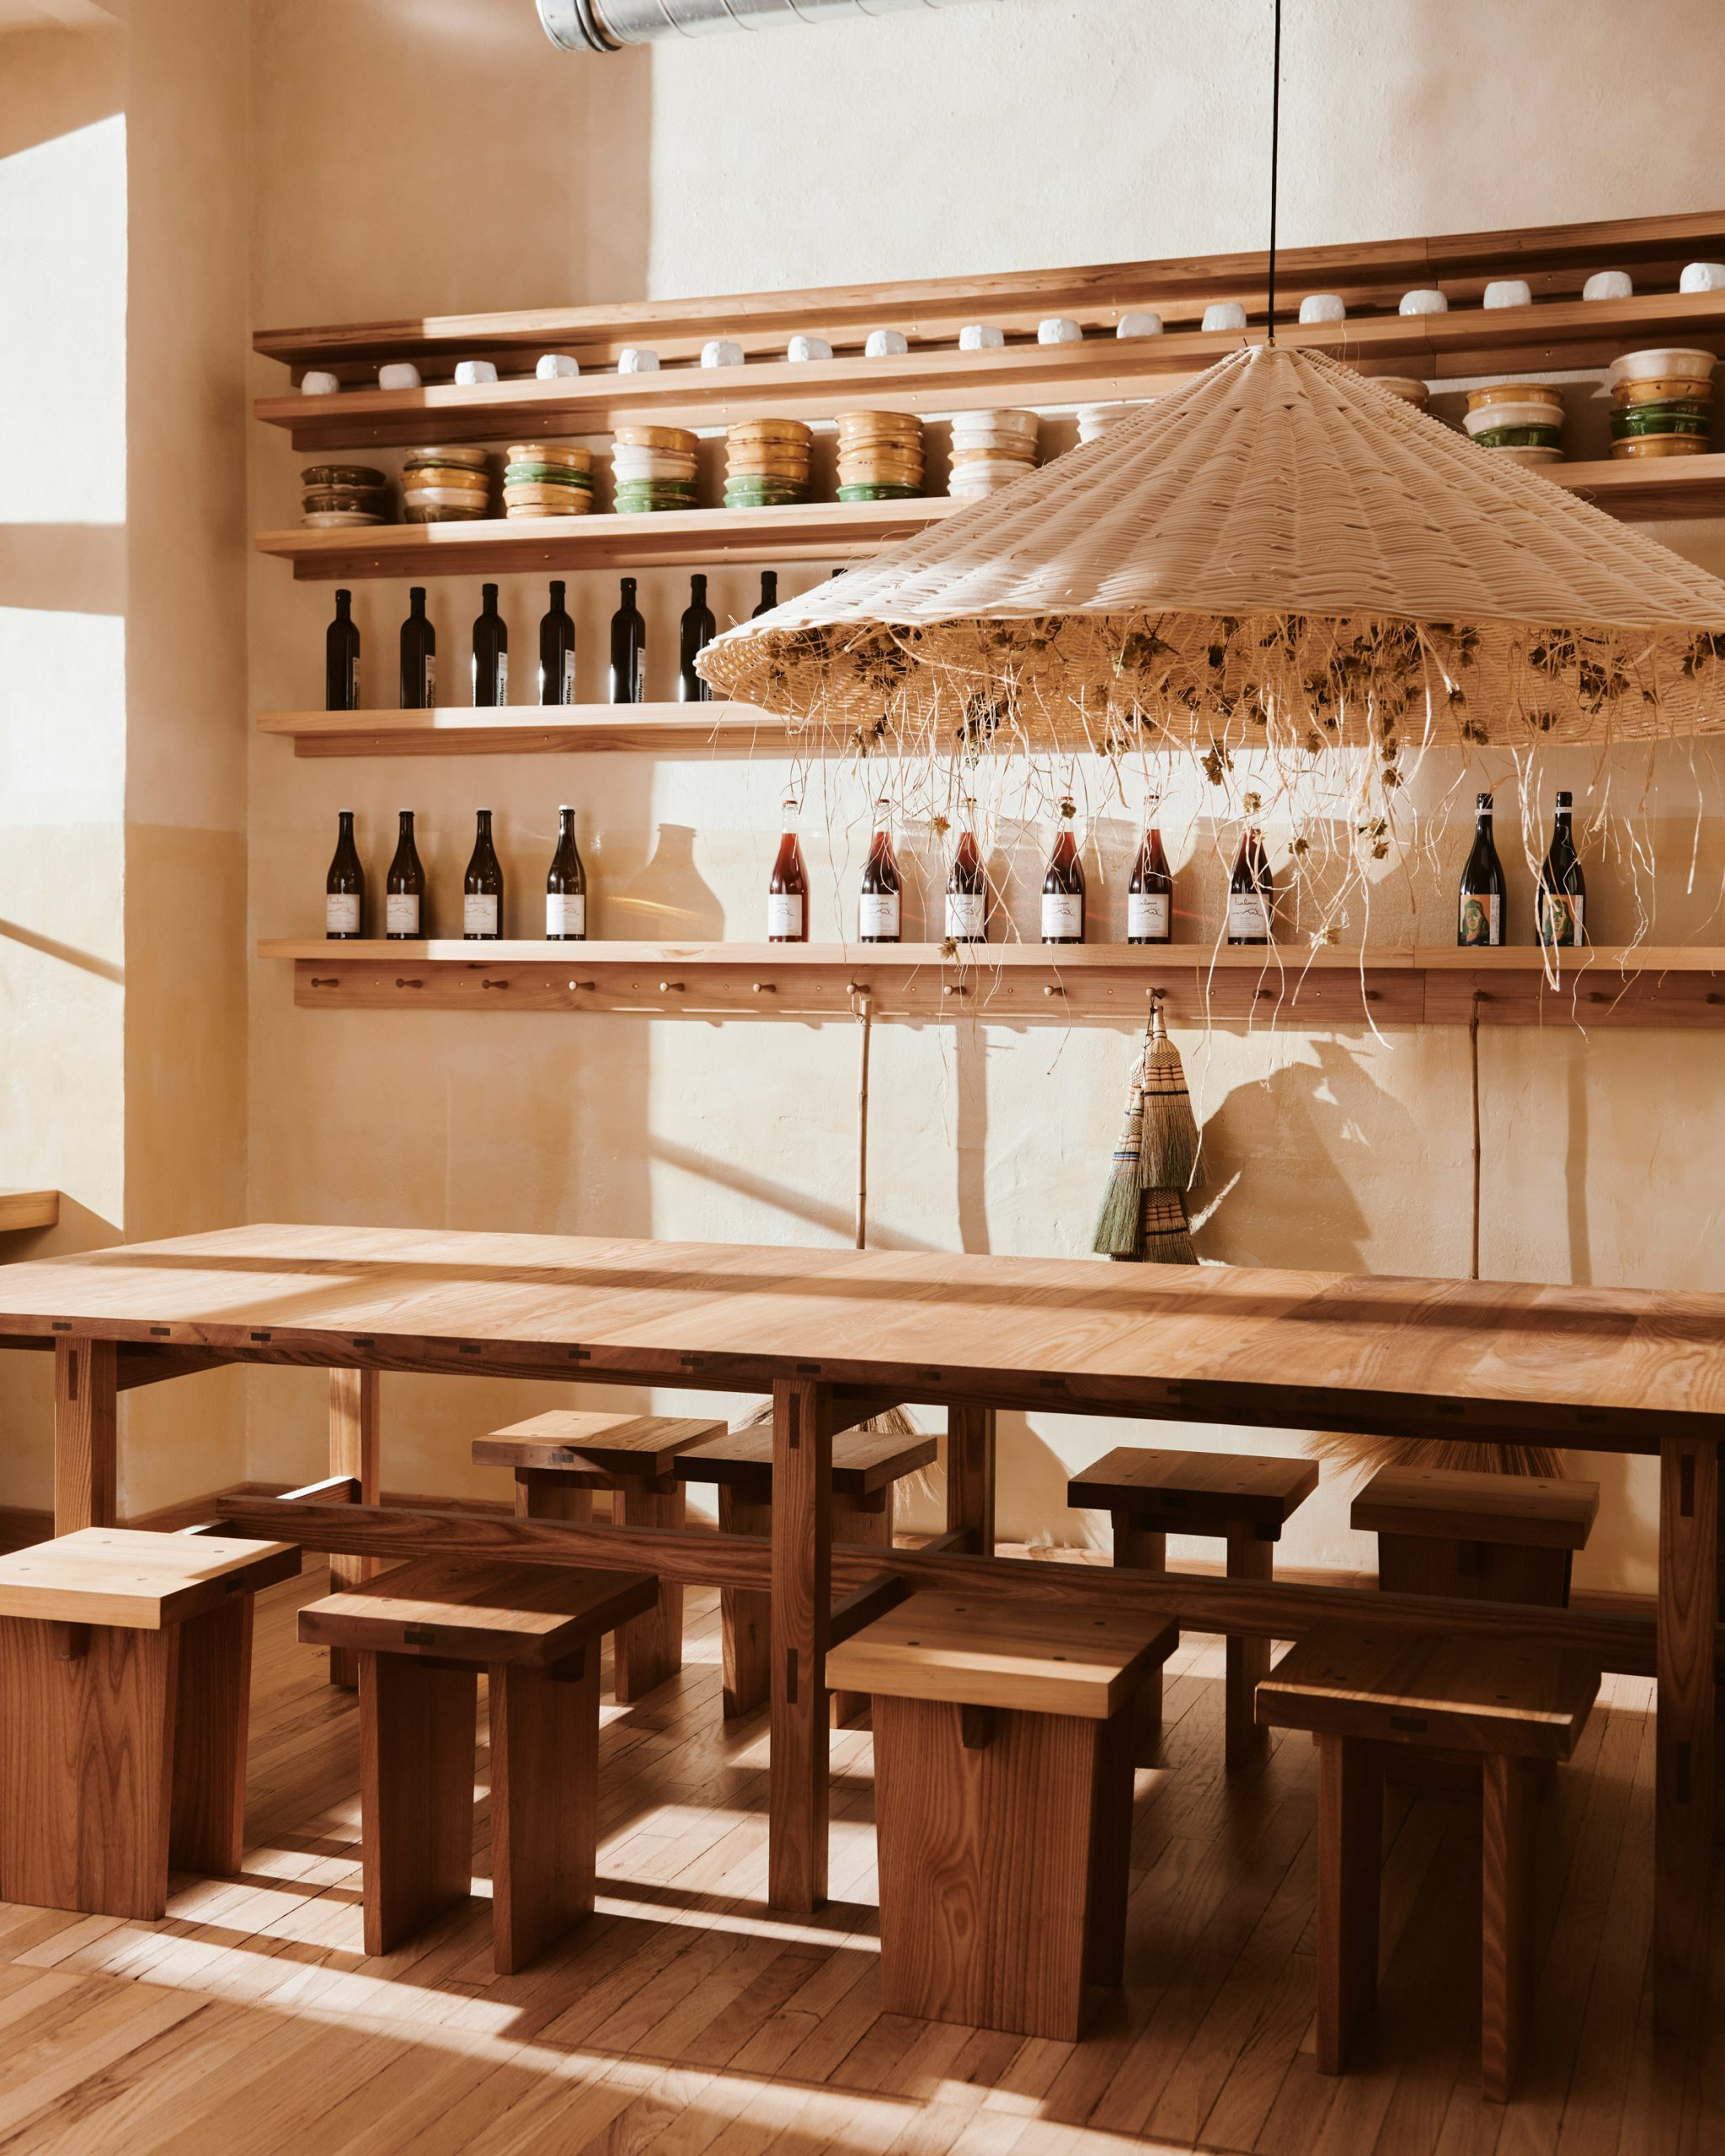 Communal table of Berlin bakery by Mathias Mentze, Alexander Vedel Ottenstein and Dreimeta